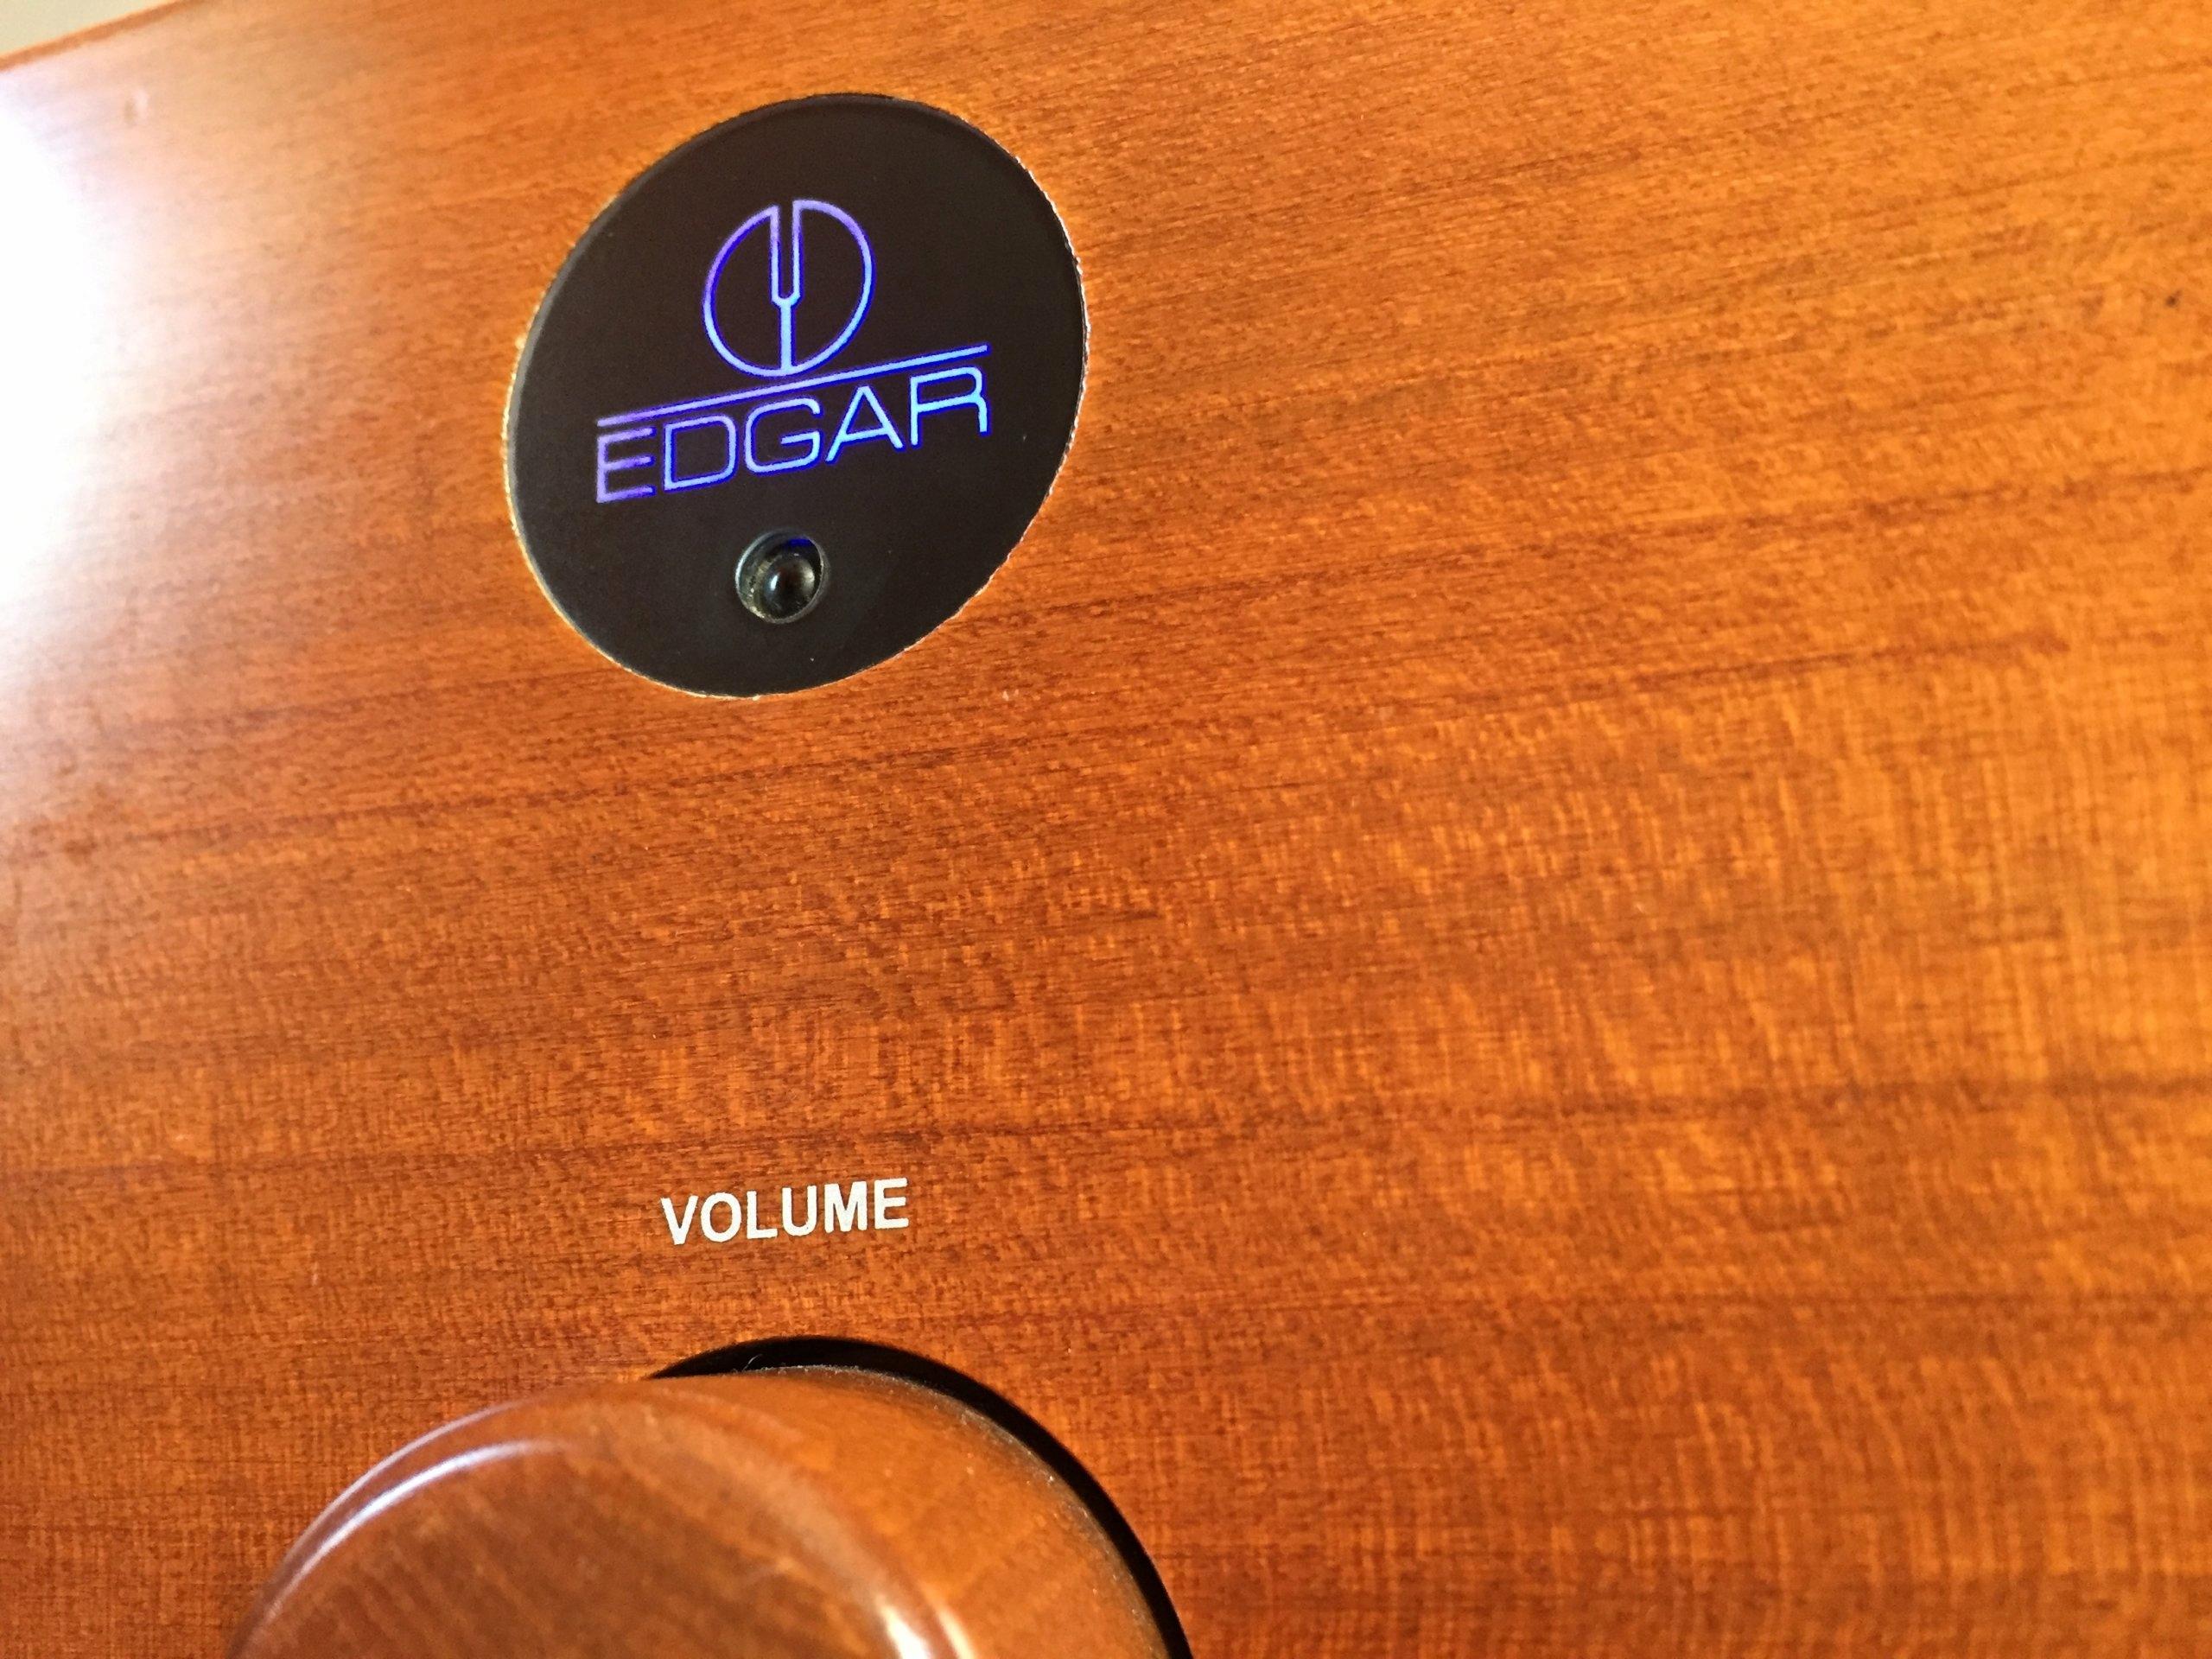 EDGAR (Canor) TP 105 VR